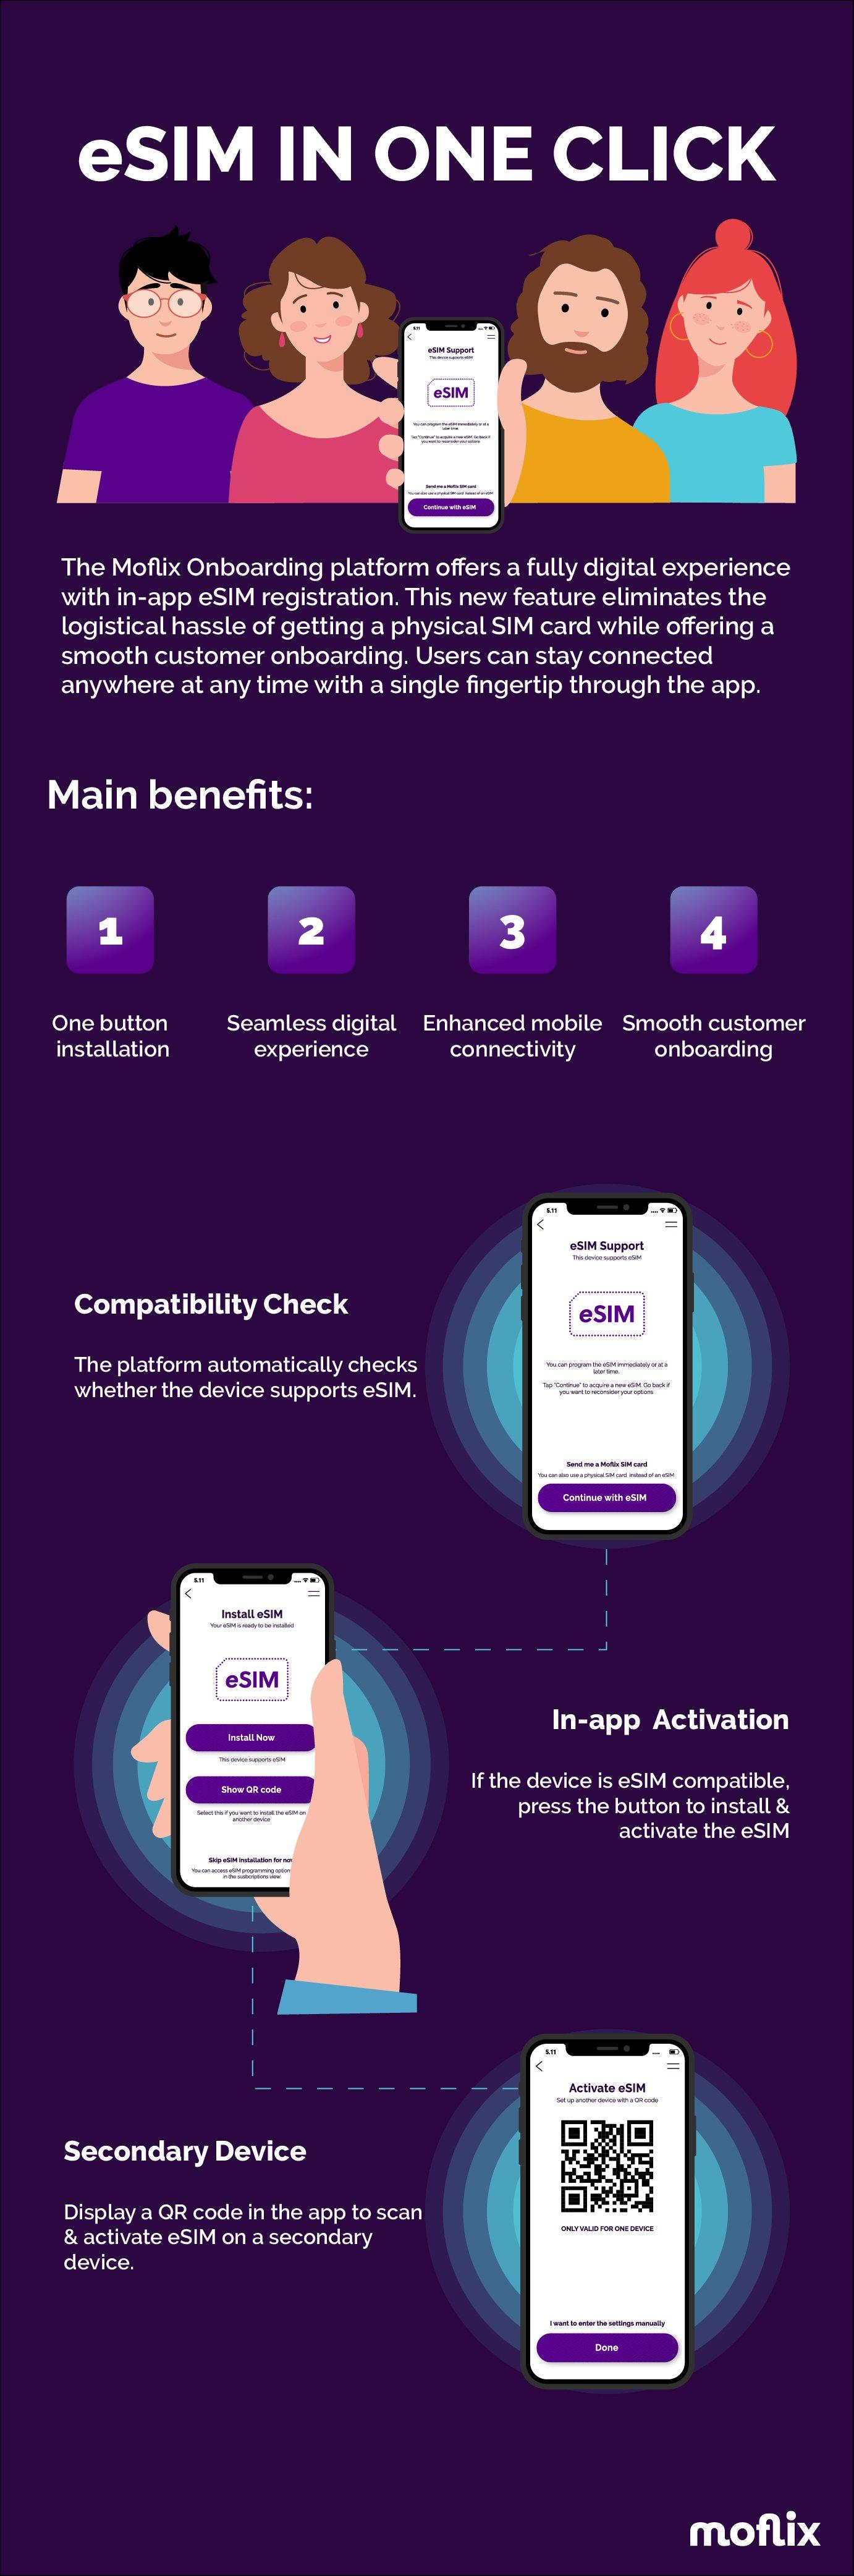 moflix-esim-infographic